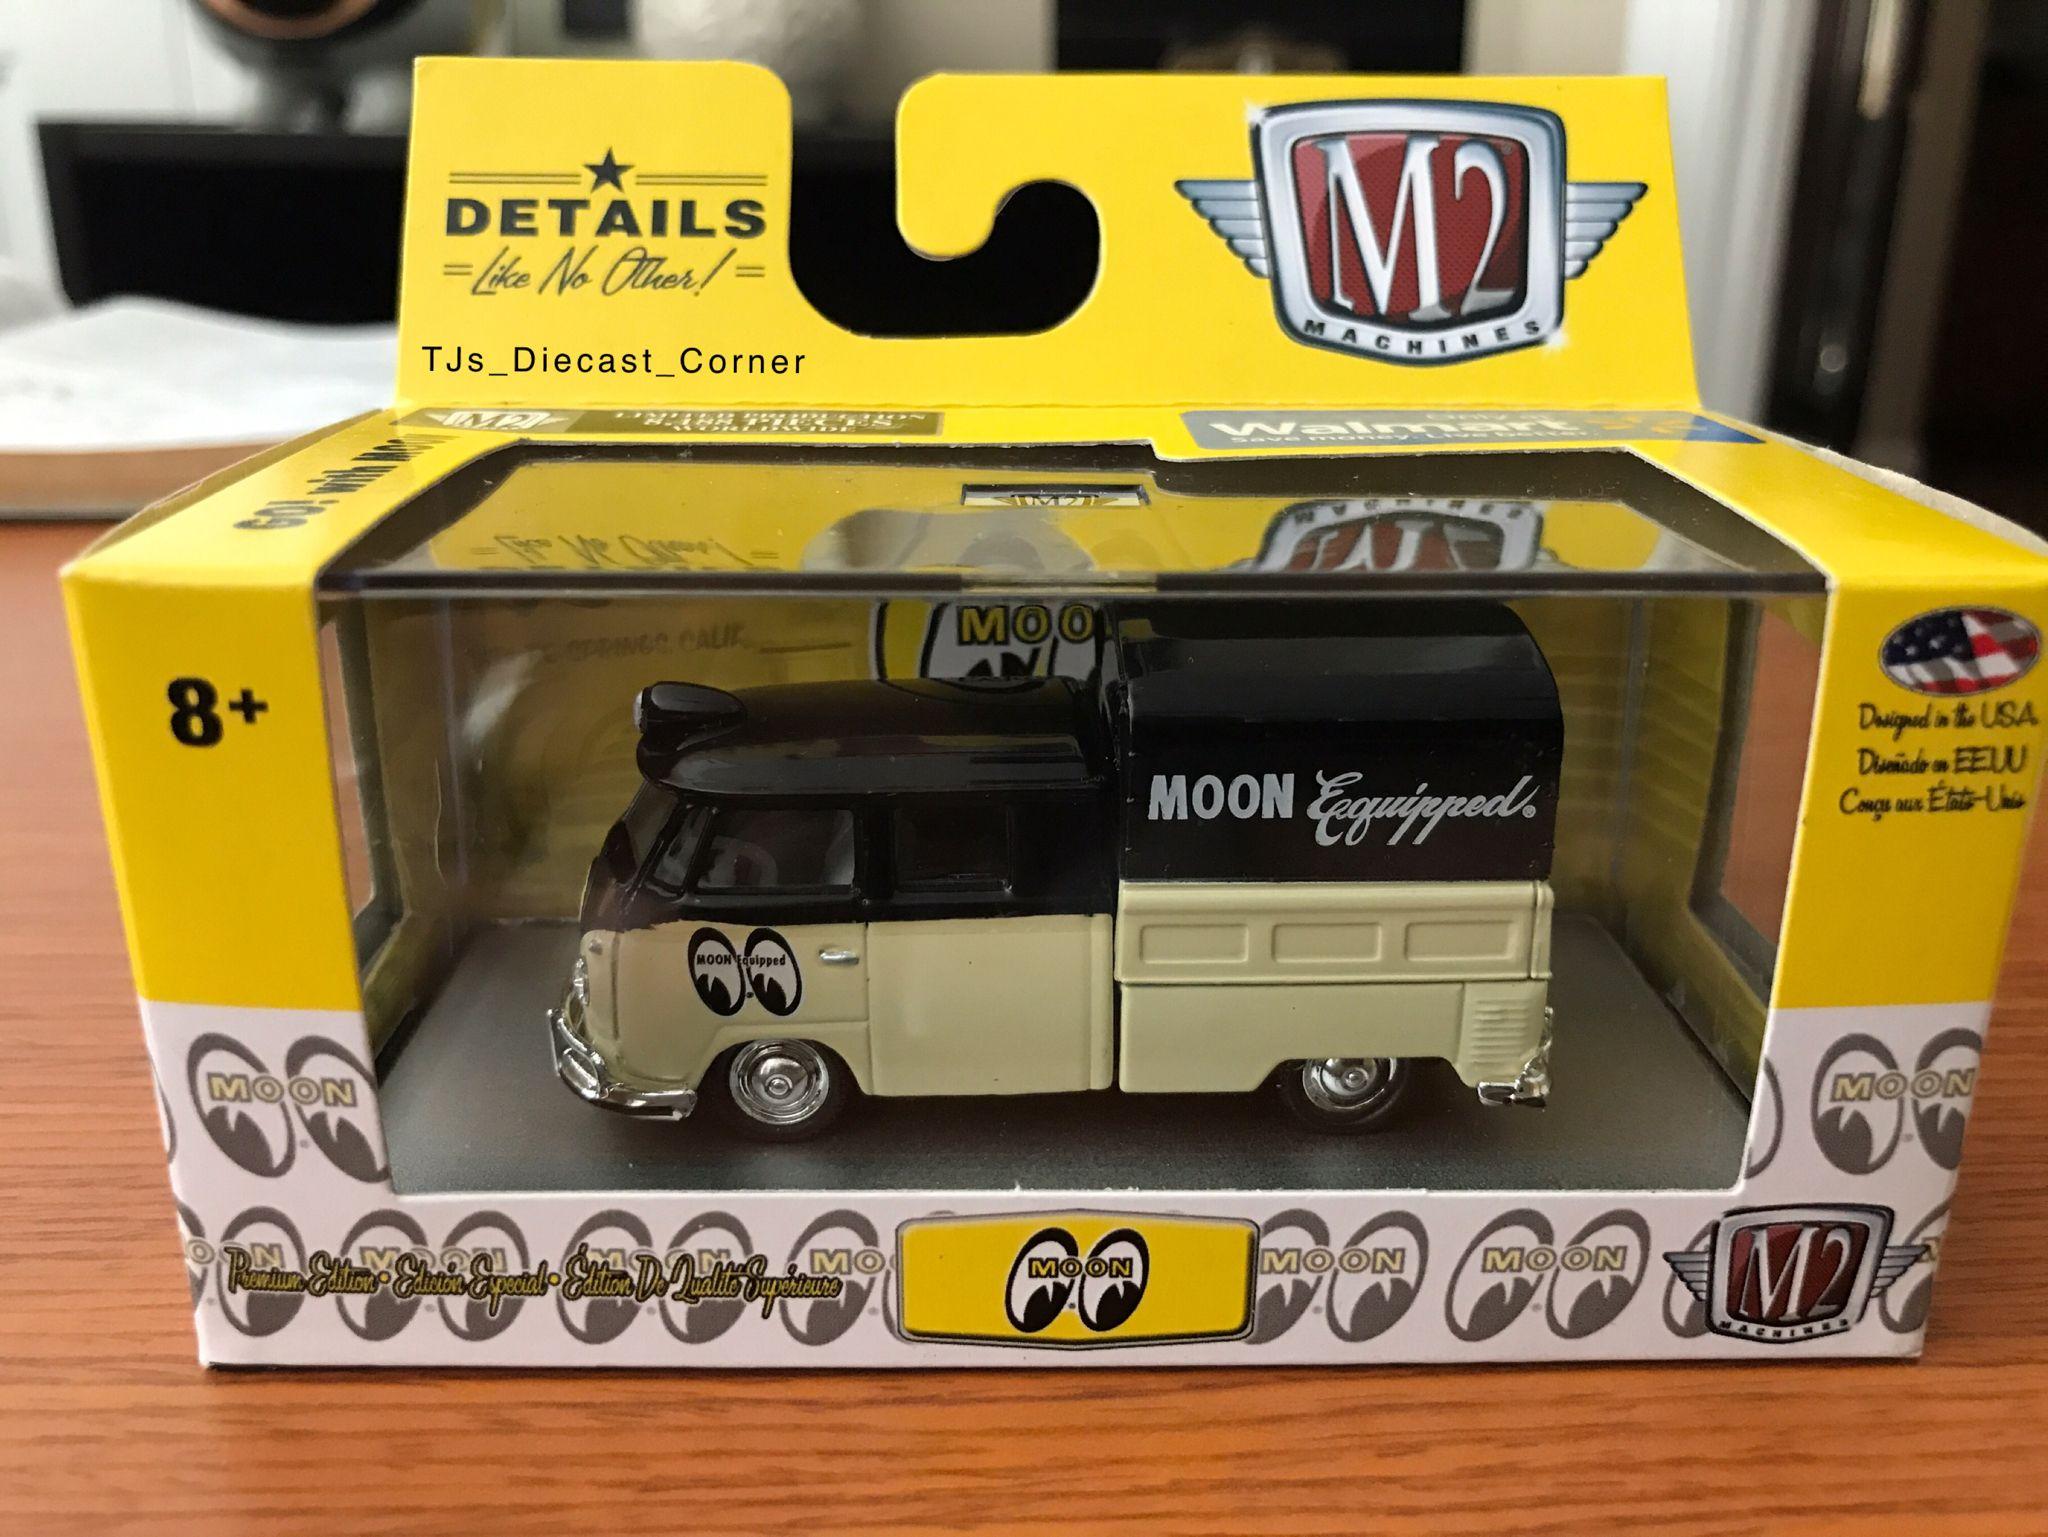 1959 VW Double Cab Truck (Walmart Exclusive) Remote